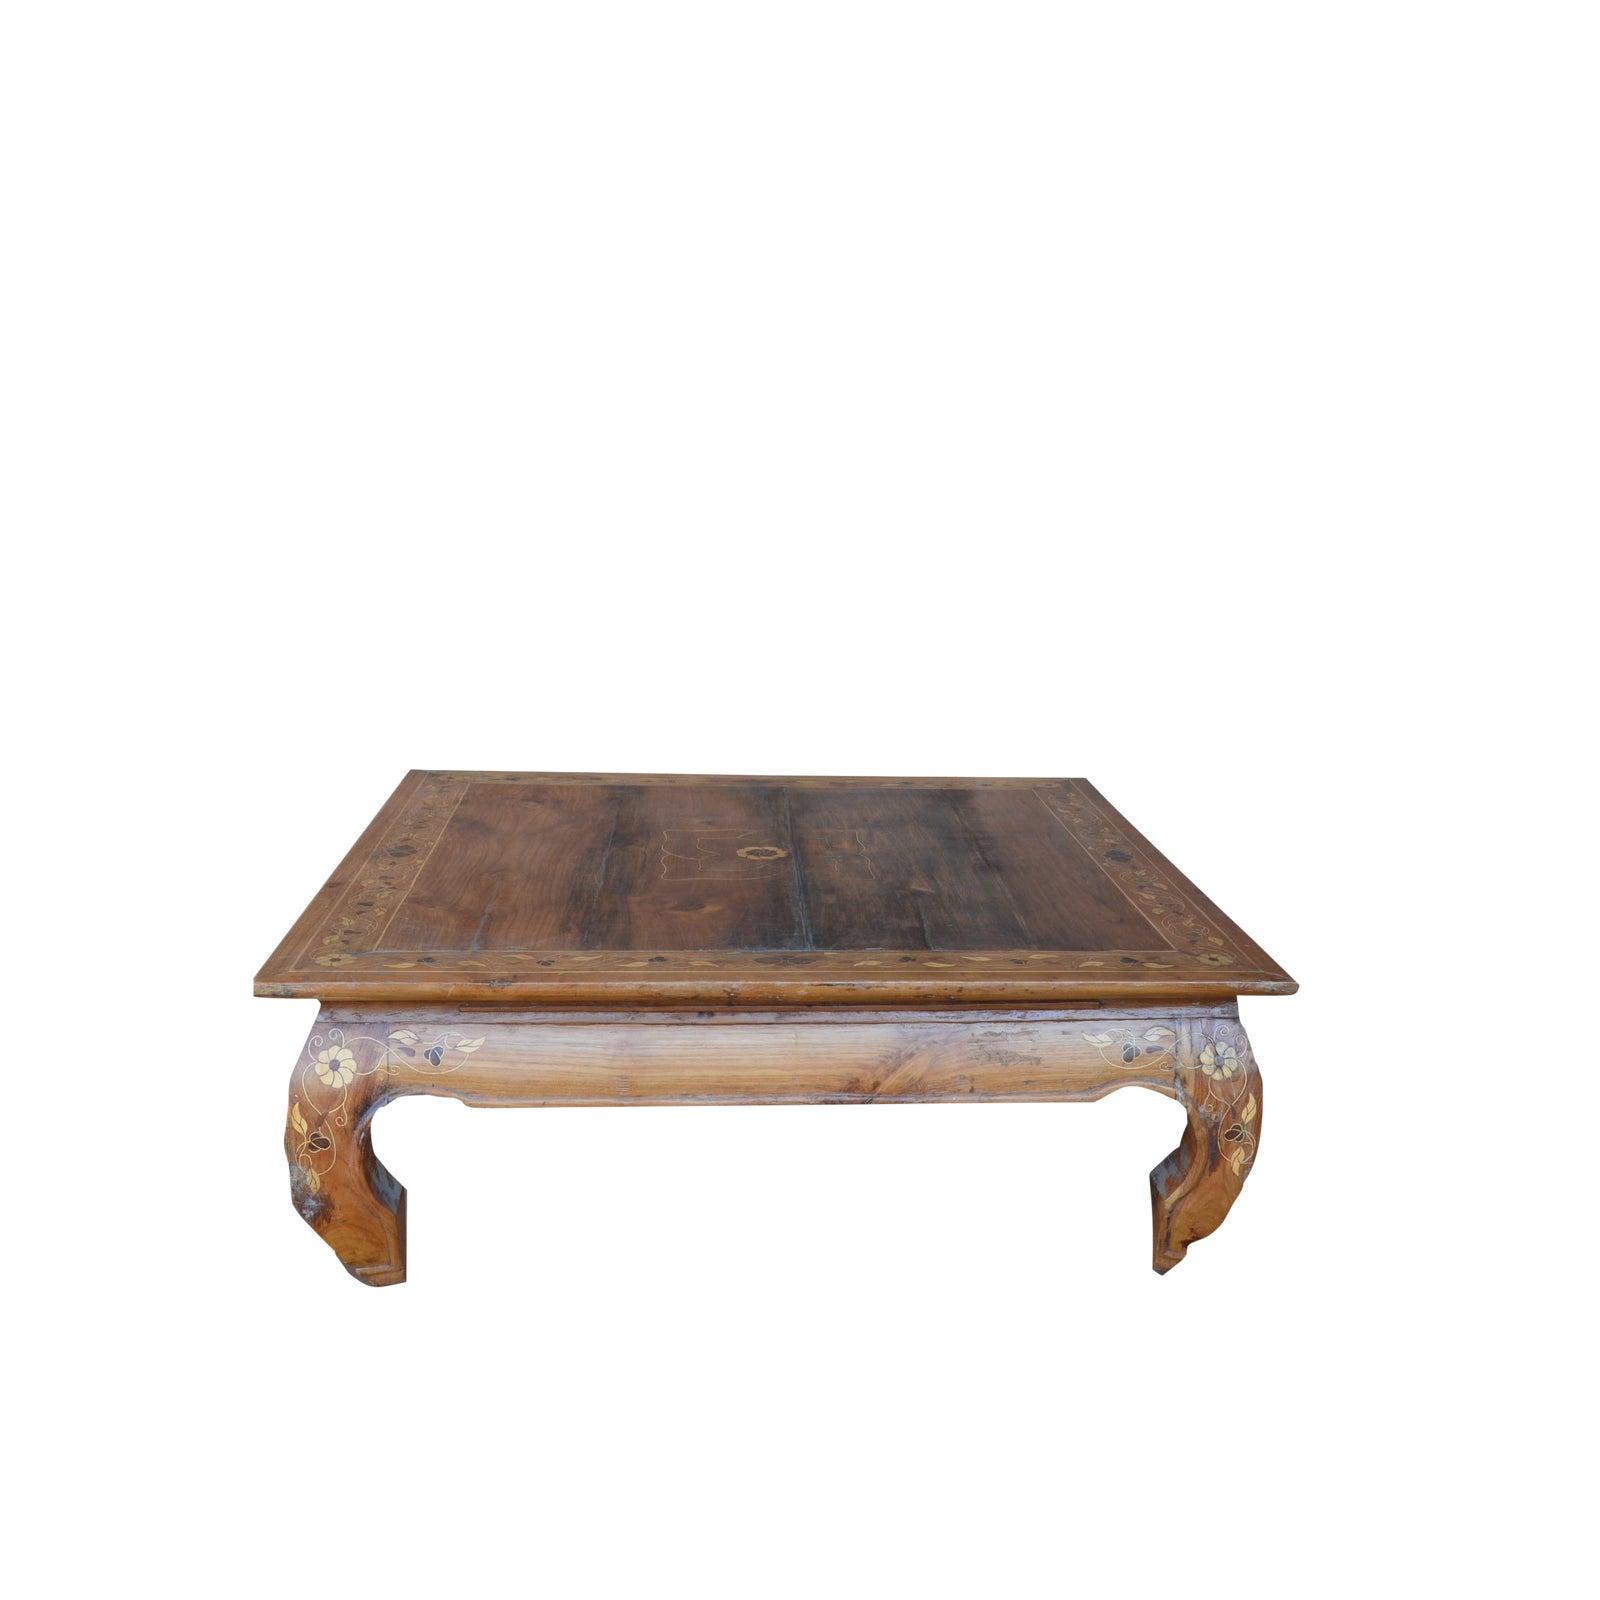 Antique light bone inlay square wood coffee table chairish